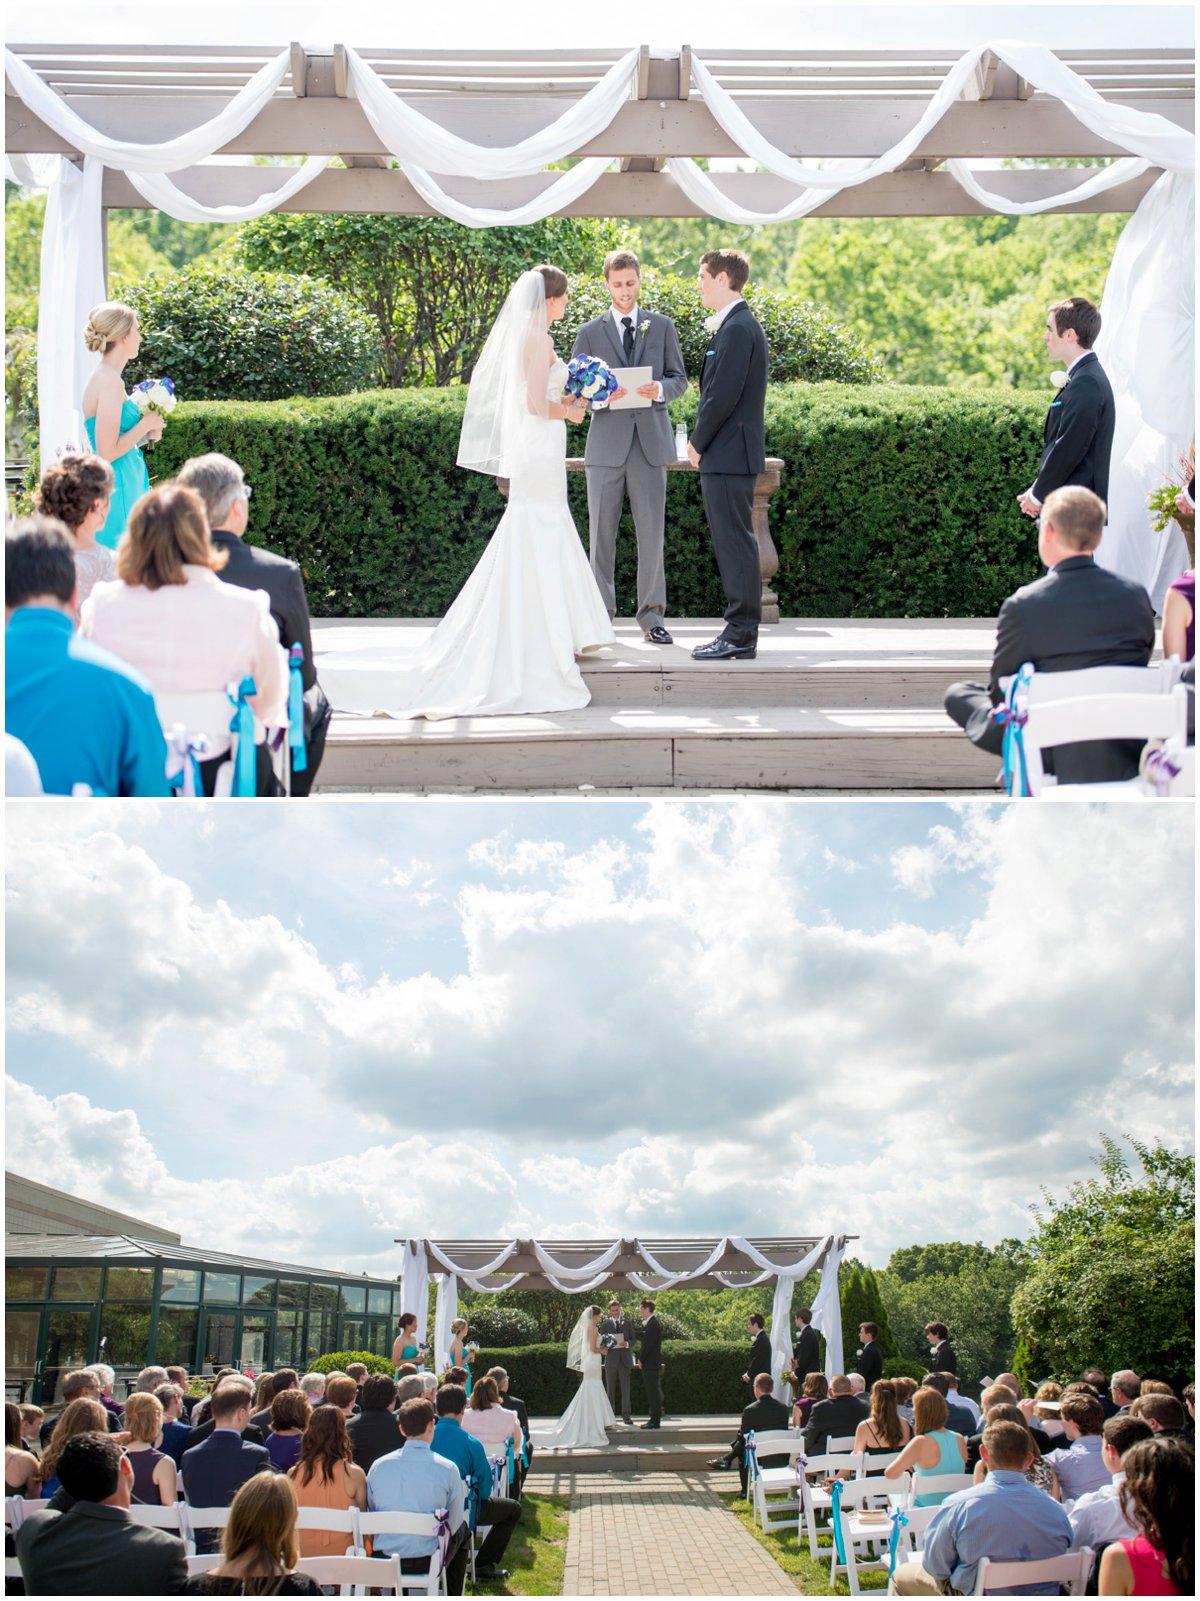 Mavris-wedding-pictures-Nate-Crouch-014.jpg